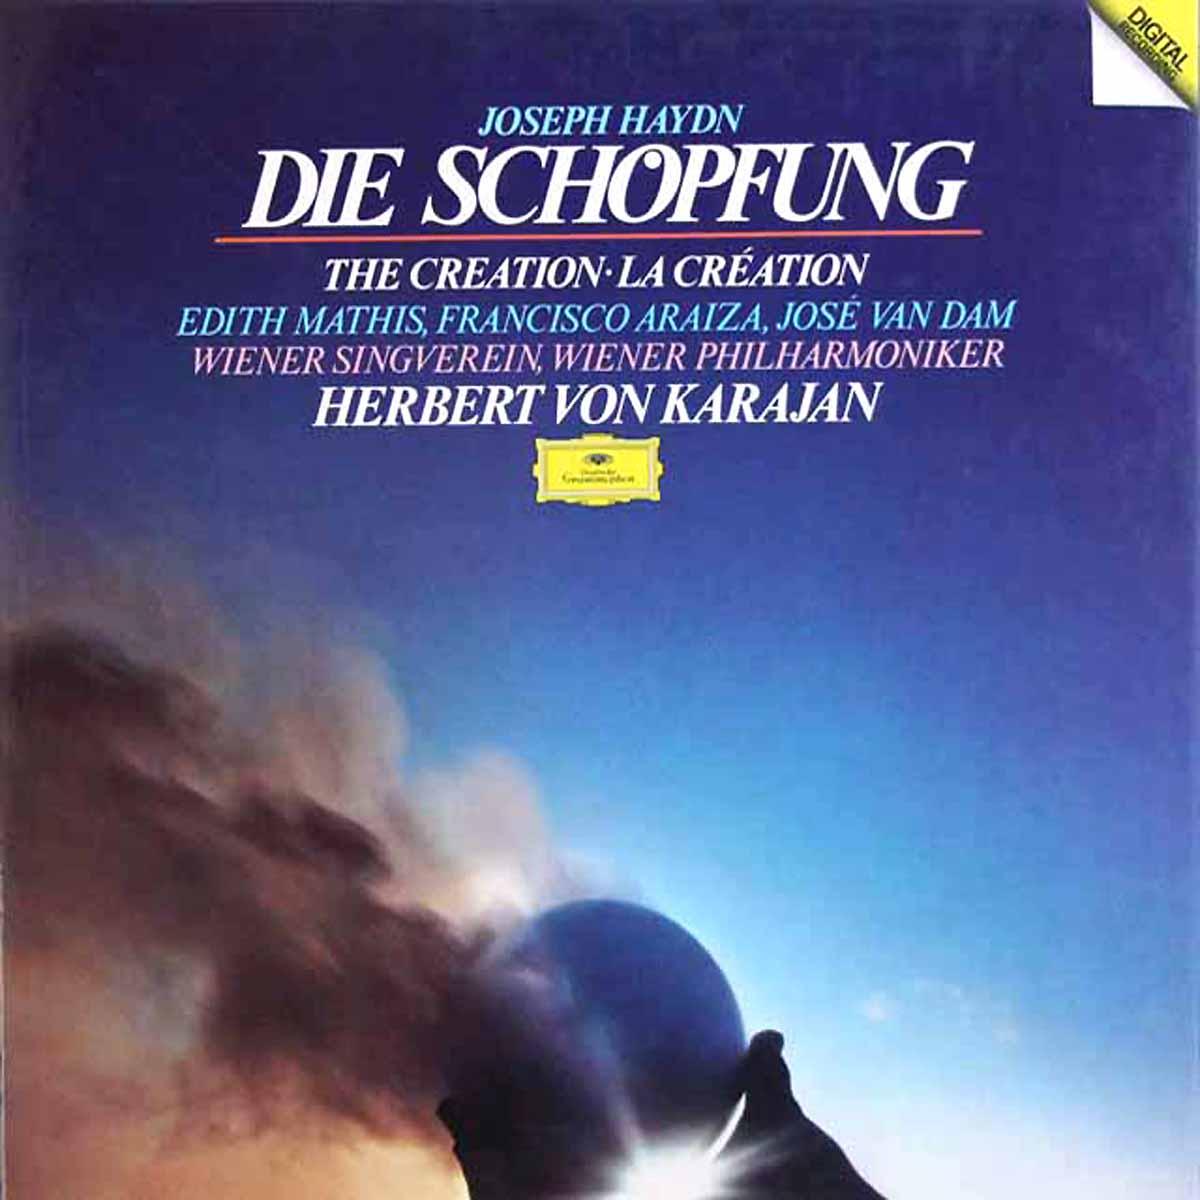 DGG 2560 101 Haydn Die Schopfung karajan DGG Digital Aufnahme